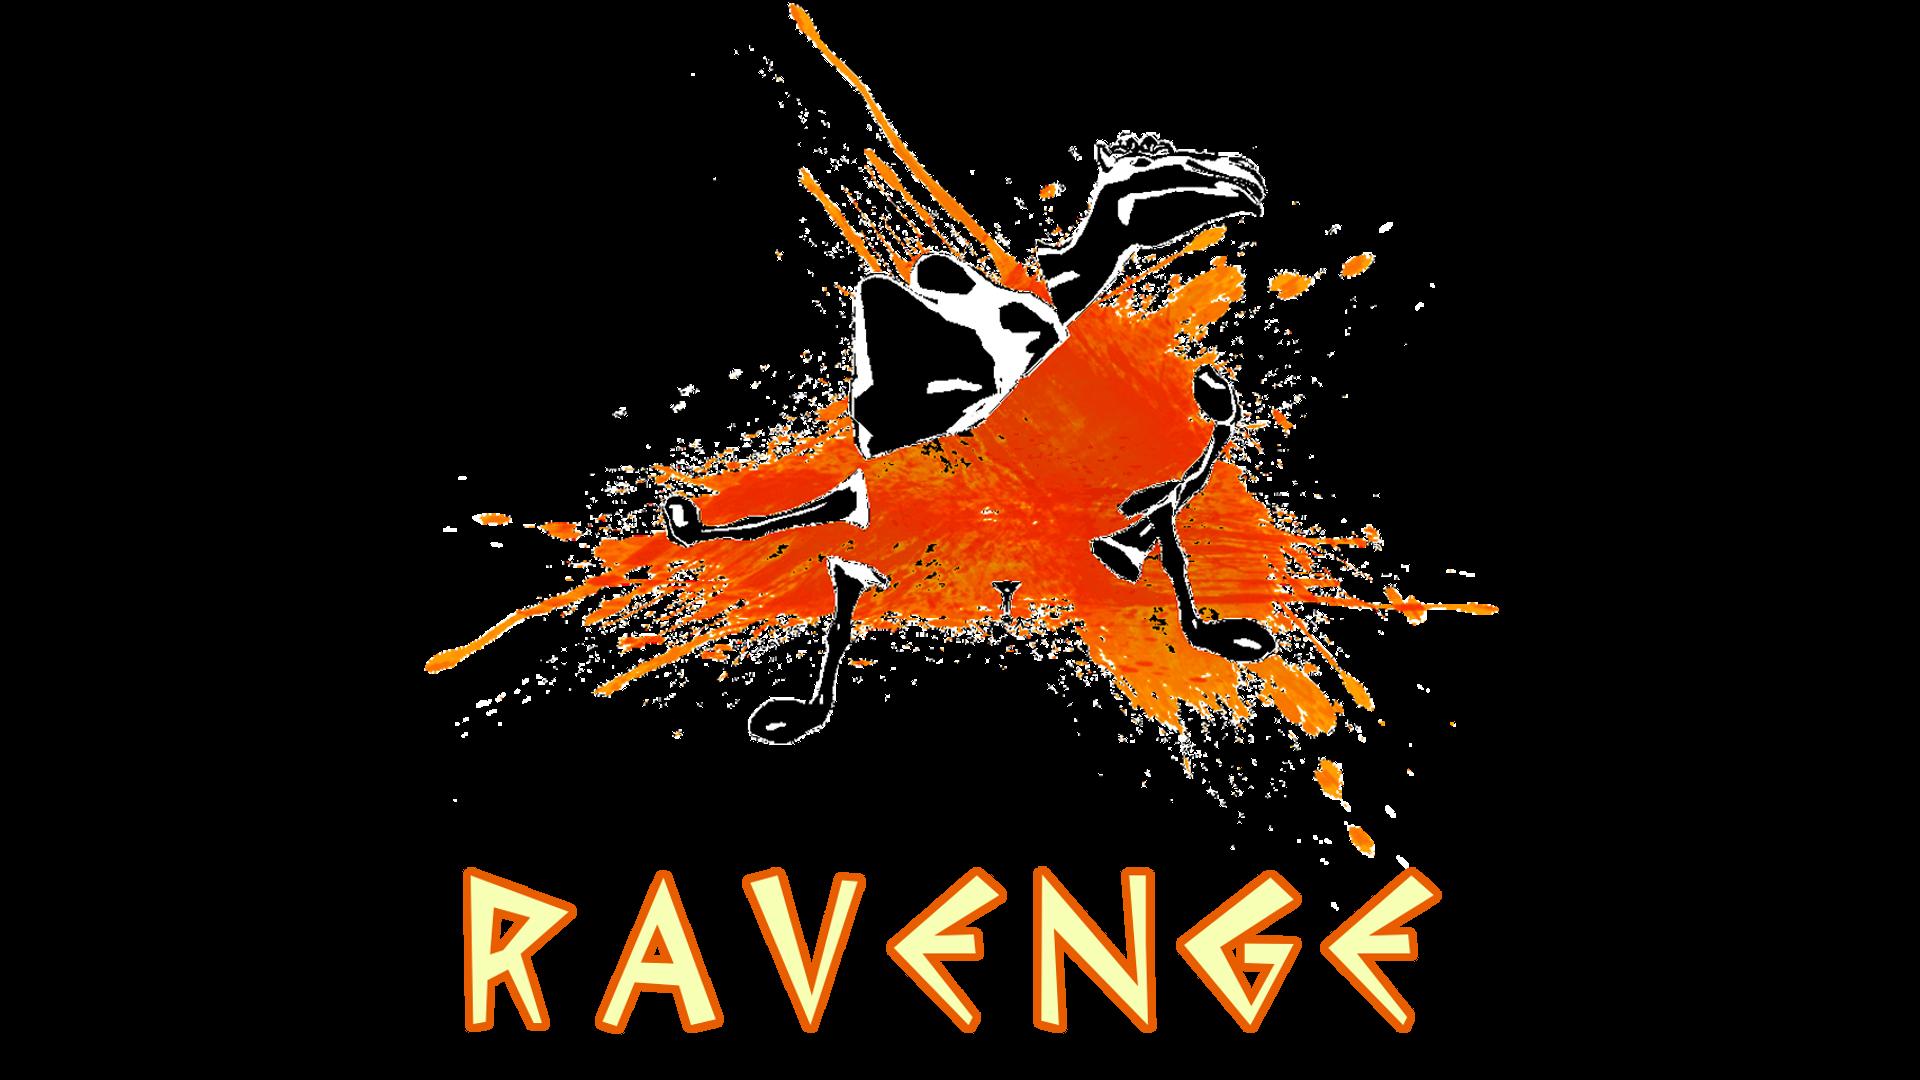 Ravenge